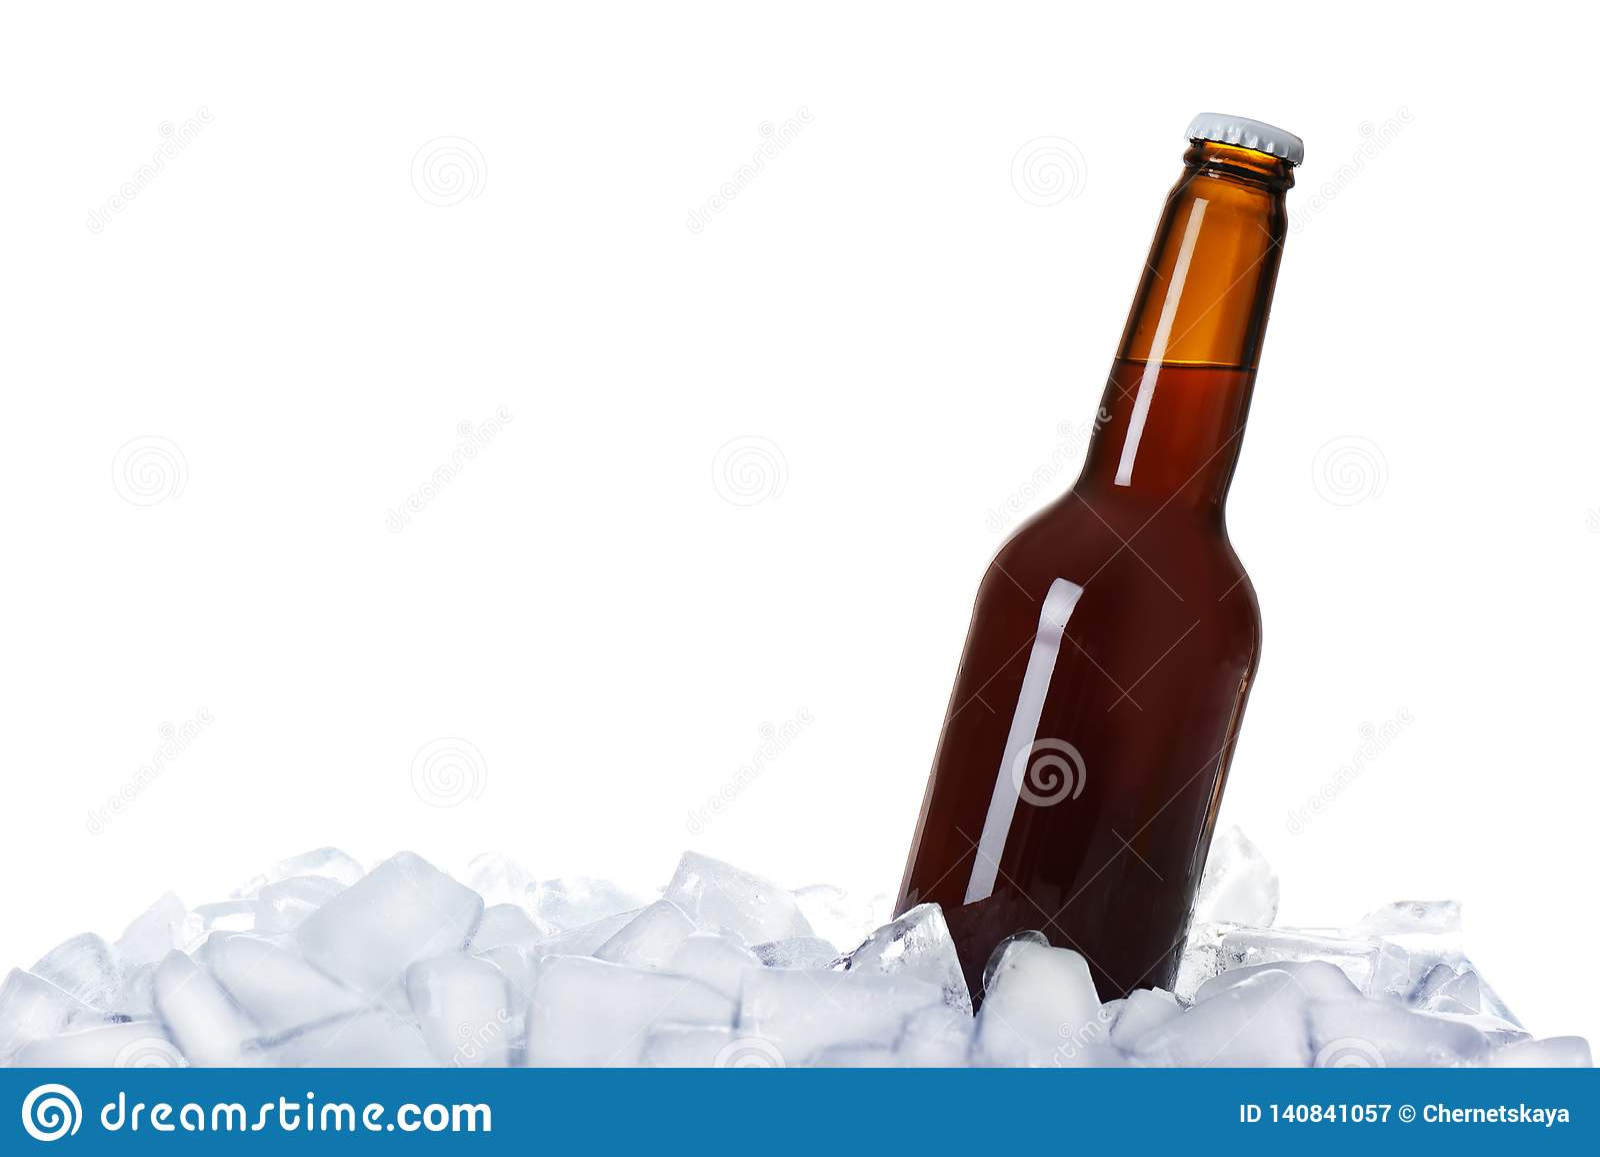 Бутылка пива на кубах льда